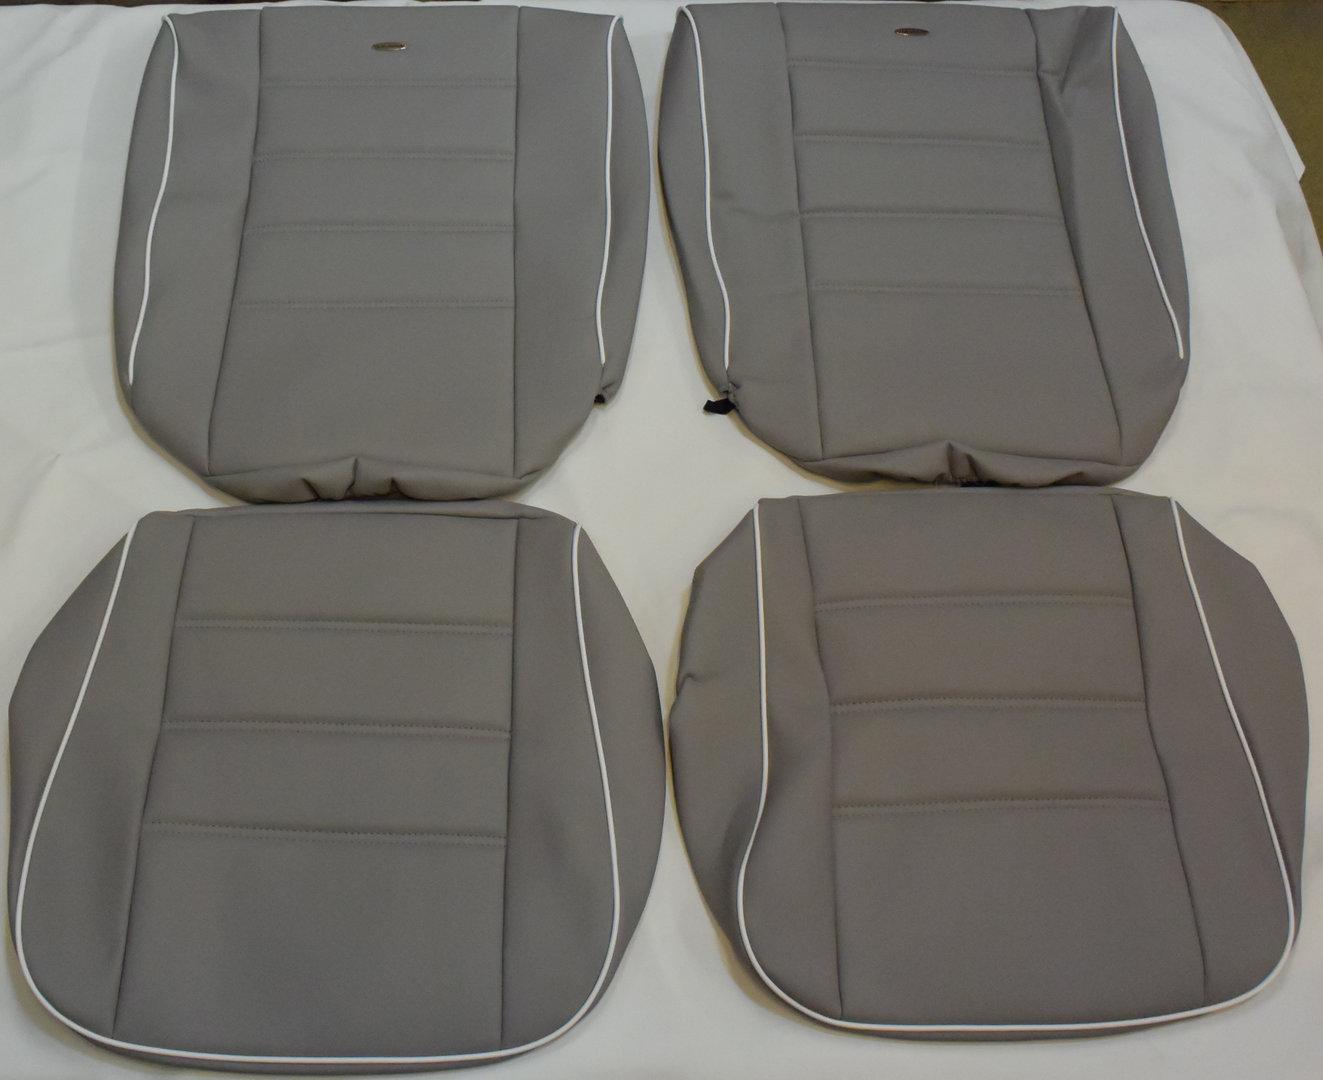 VW Käfer Limousine 08/72 - 07/73 Maß Sitzbezüge in grau